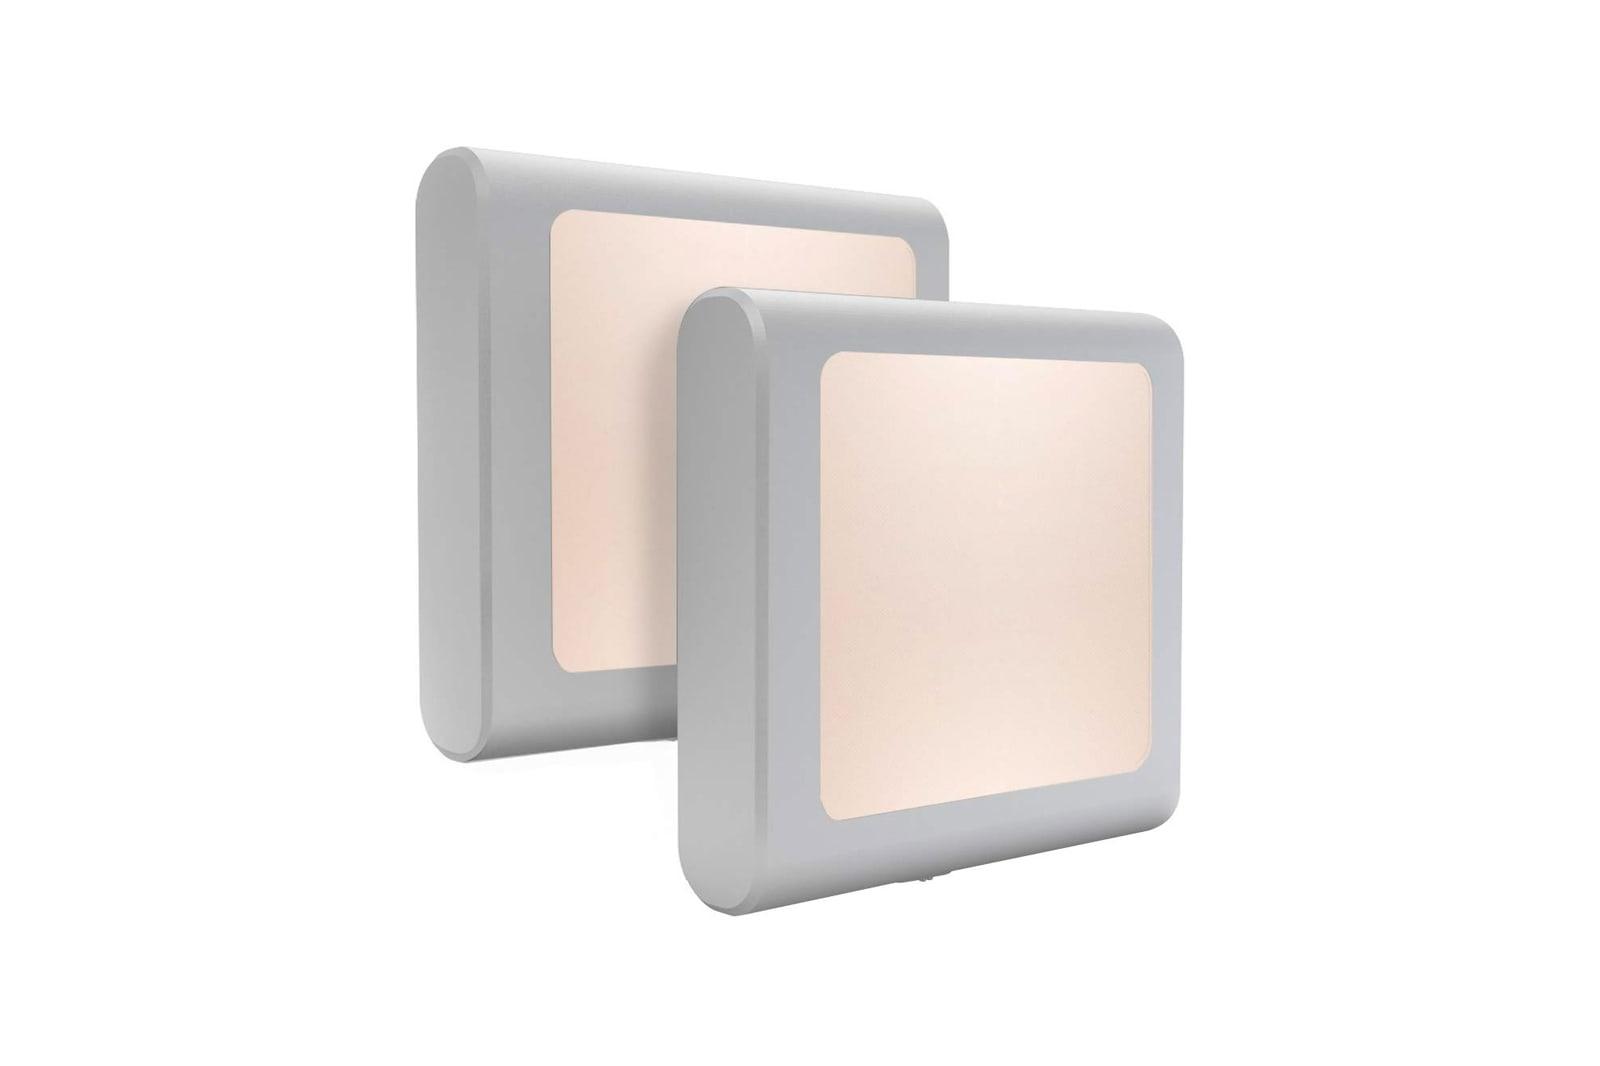 Maz-Tek Plug-in LED Night-Light